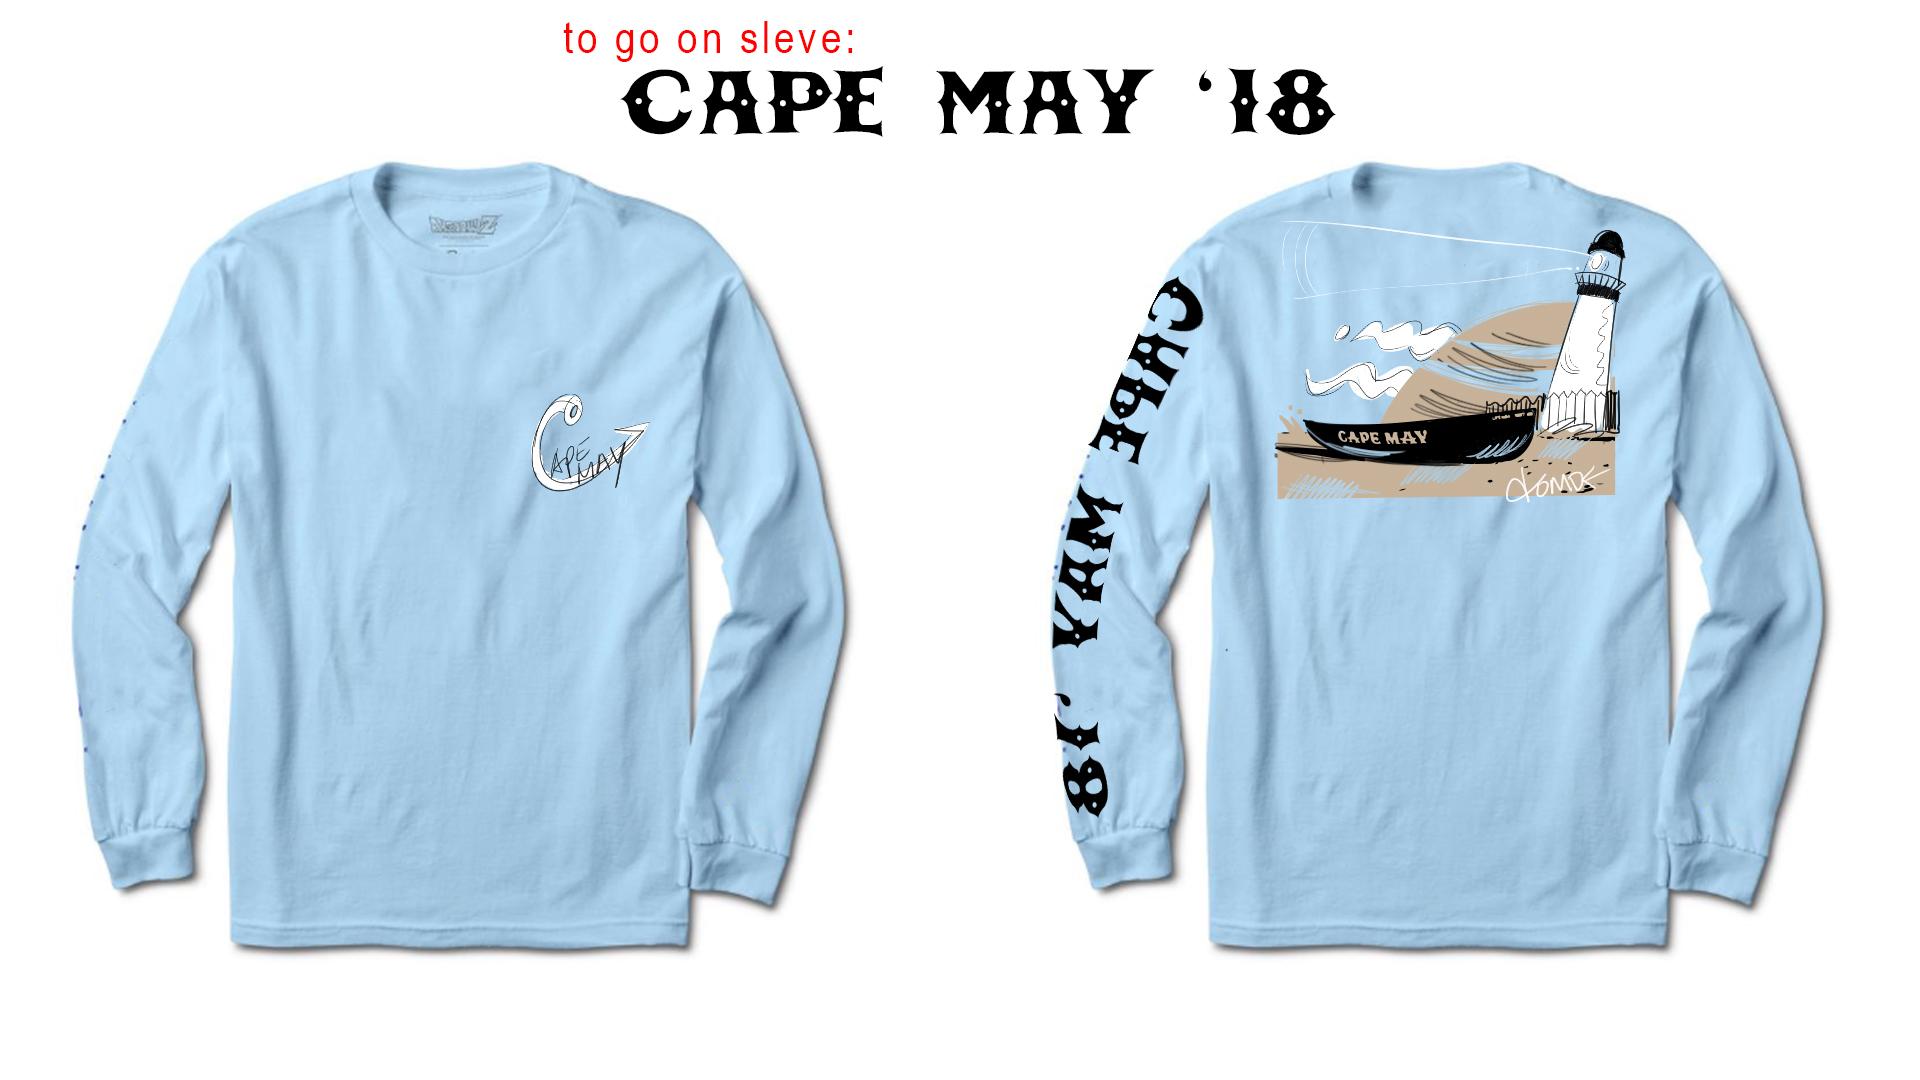 Tee Shirt Design 1